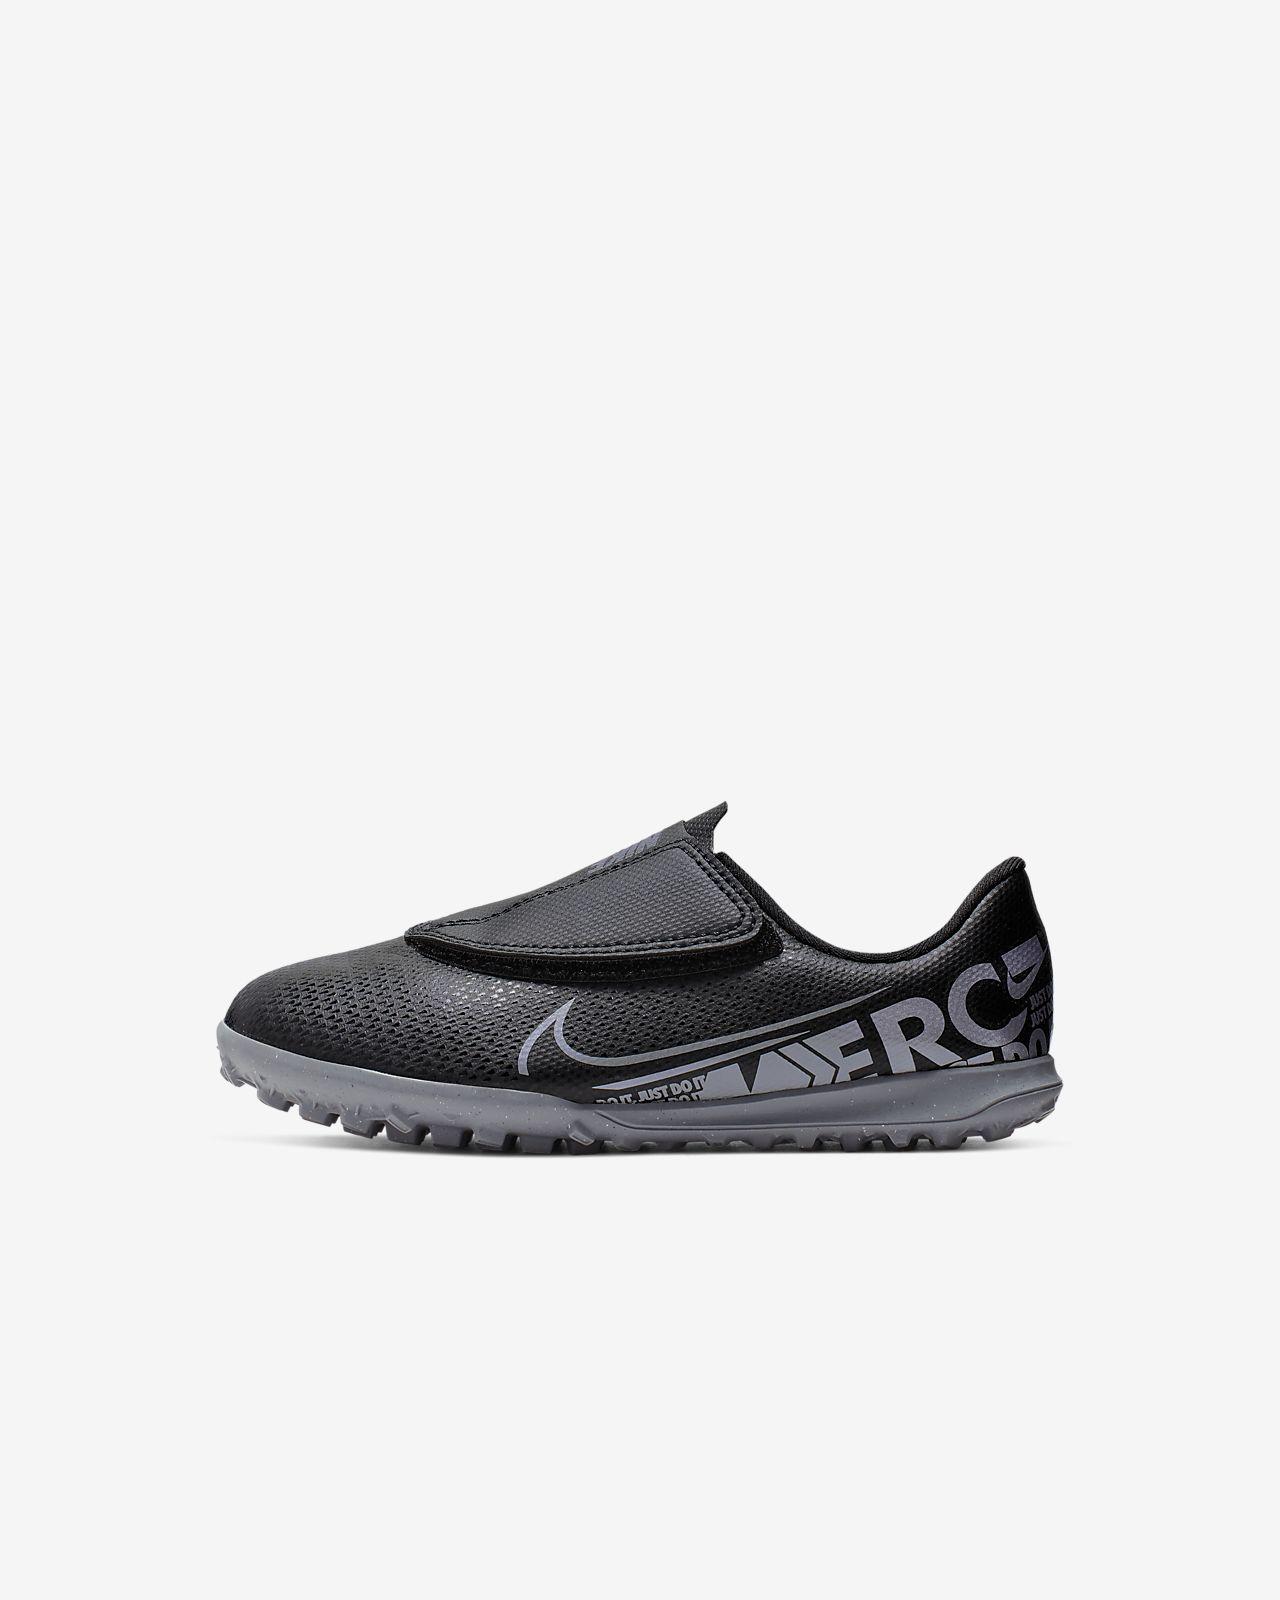 Nike Jr. Mercurial Vapor 13 Club TF Voetbalschoen voor peuters/kleuters (turf)